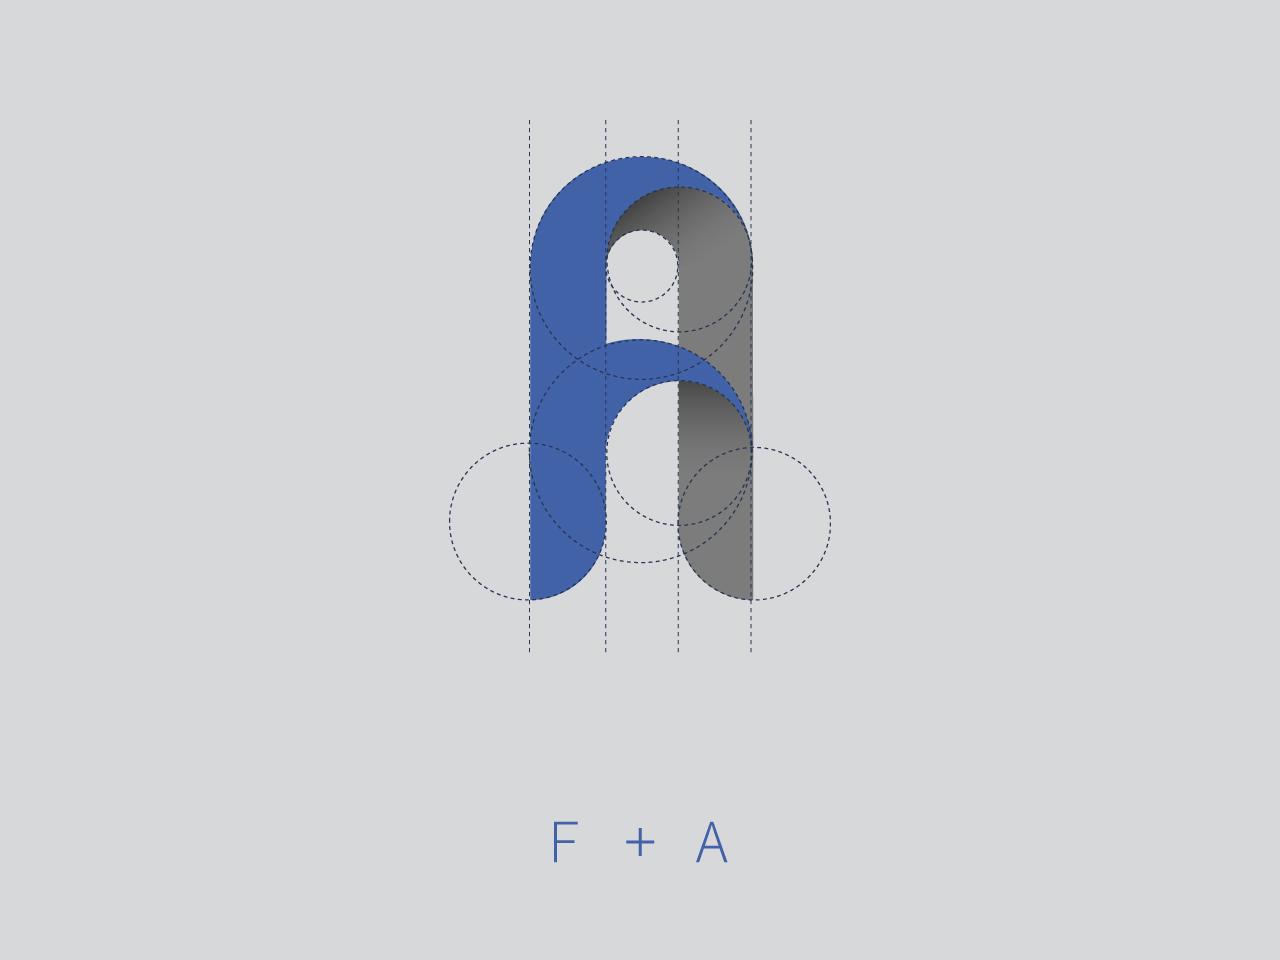 F+A typography design logo